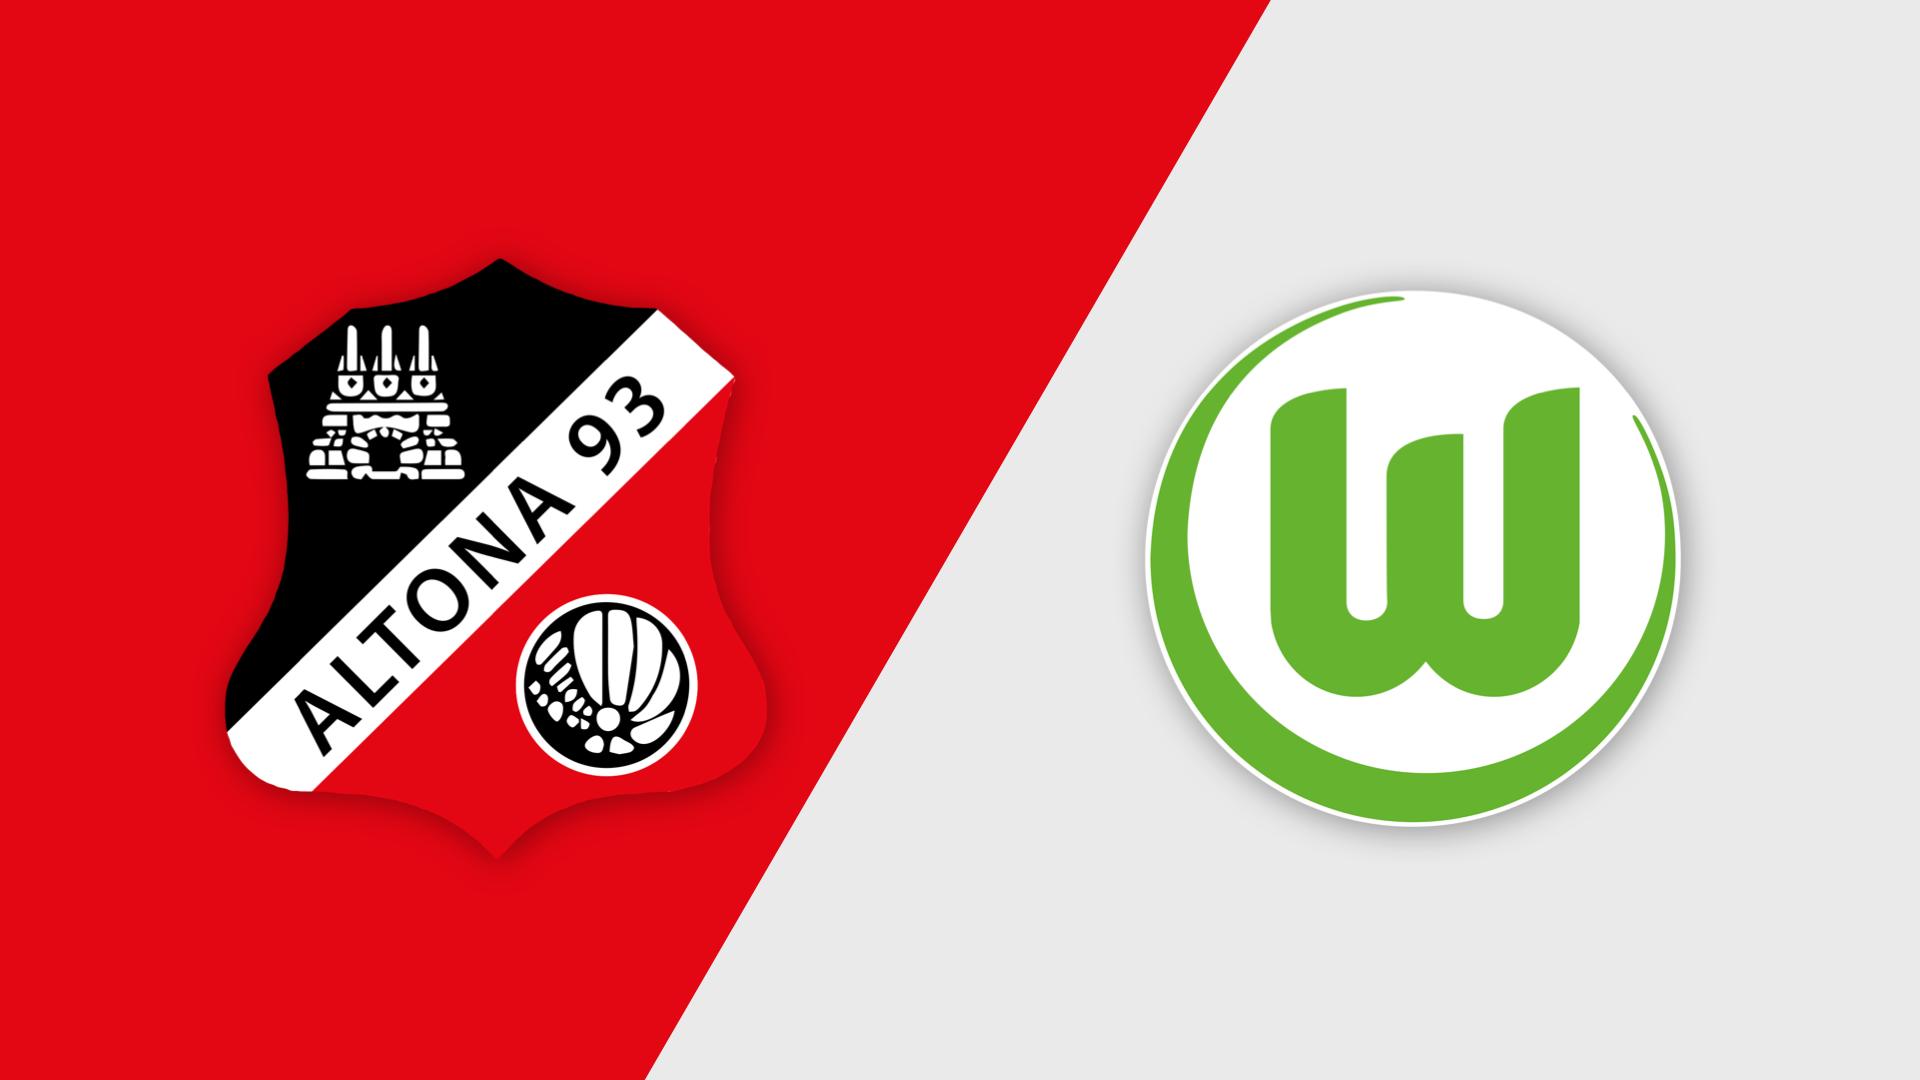 Altona 93 1. gegen VfL Wolfsburg II